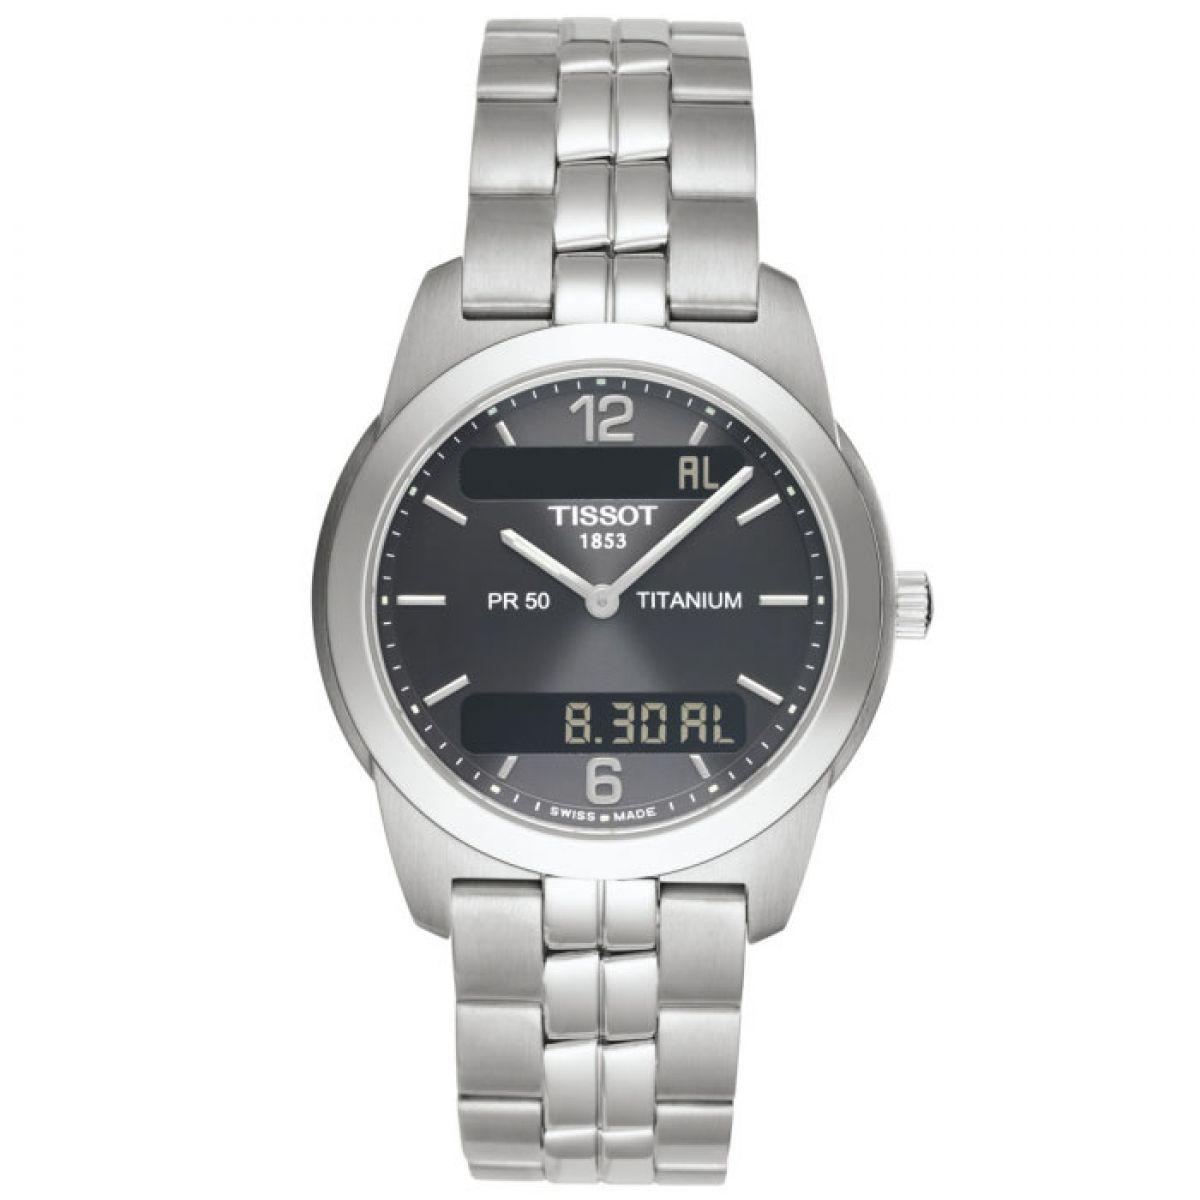 gents tissot pr50 seven alarm chronograph watch t34748762 rh watchshop com tissot 1853 pr50 titanium manual Titanium Watches Men Tissot